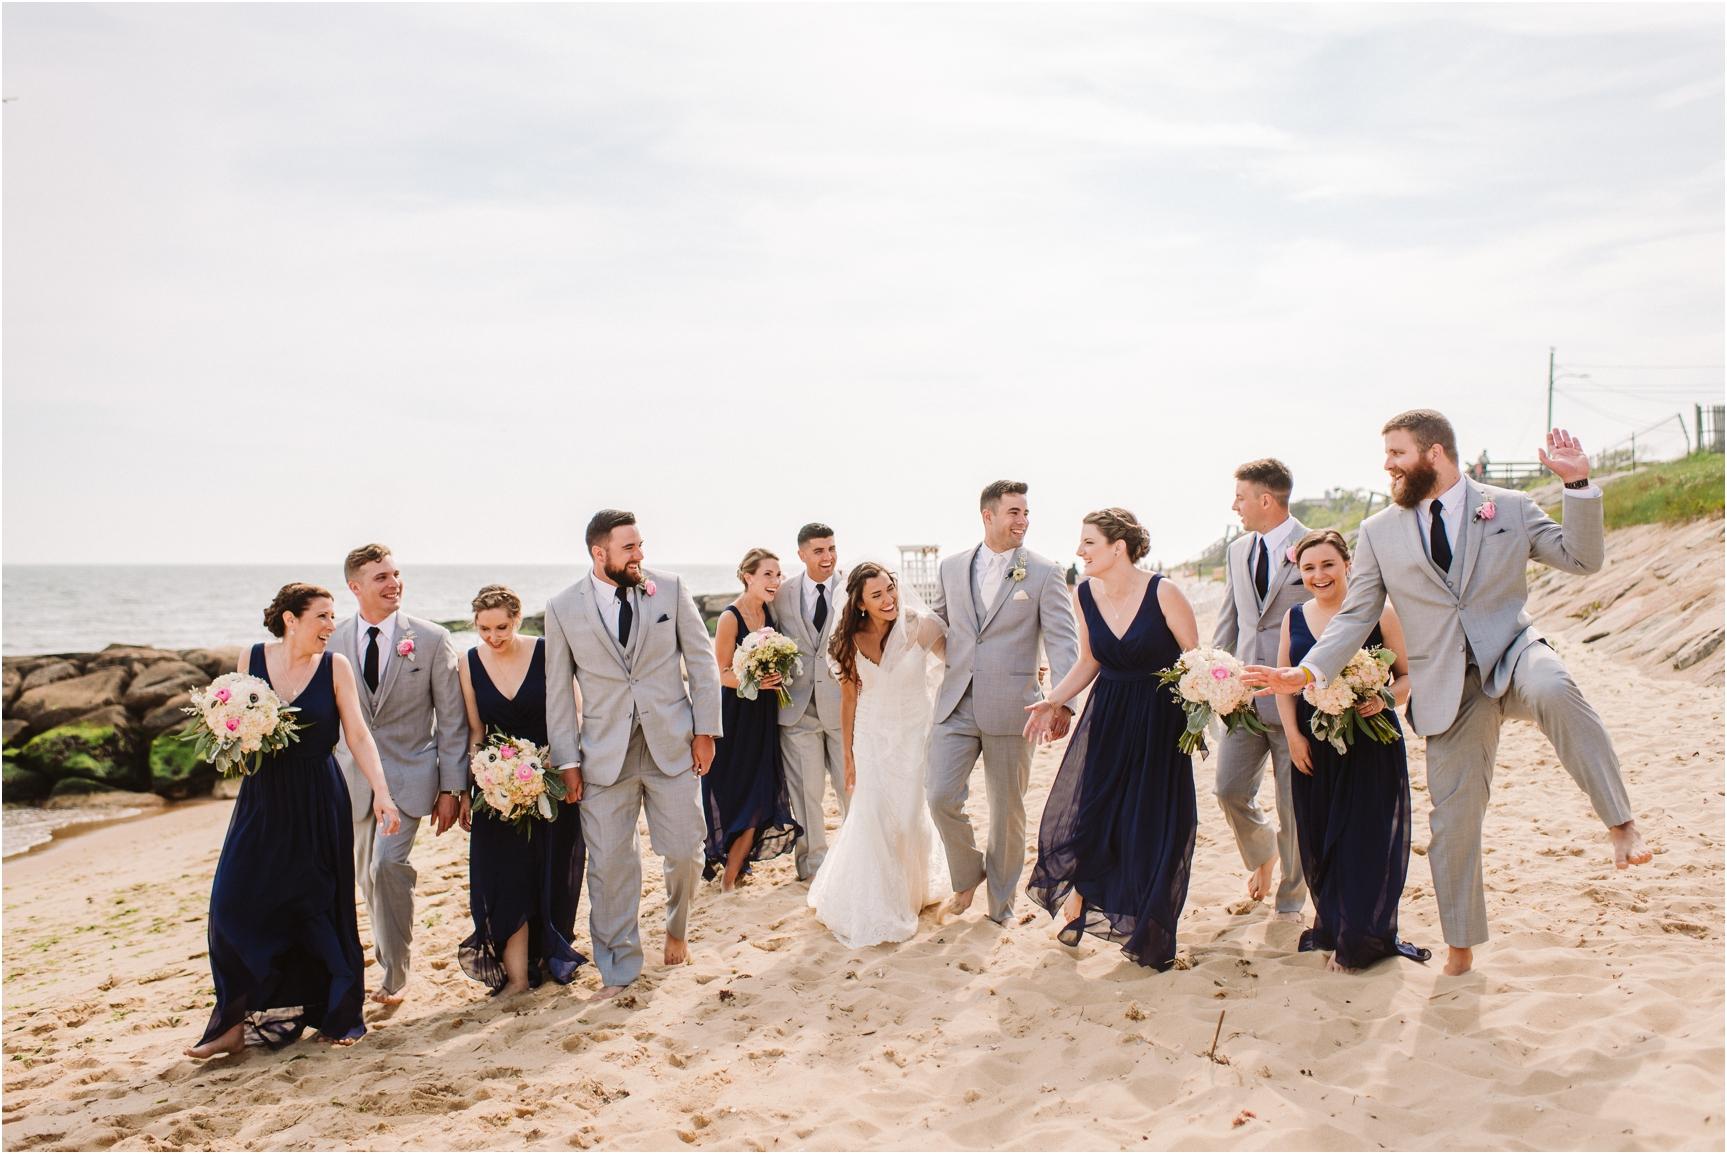 Sarah & Sam Pelham House Cape Cod Wedding Photographer-120.jpg